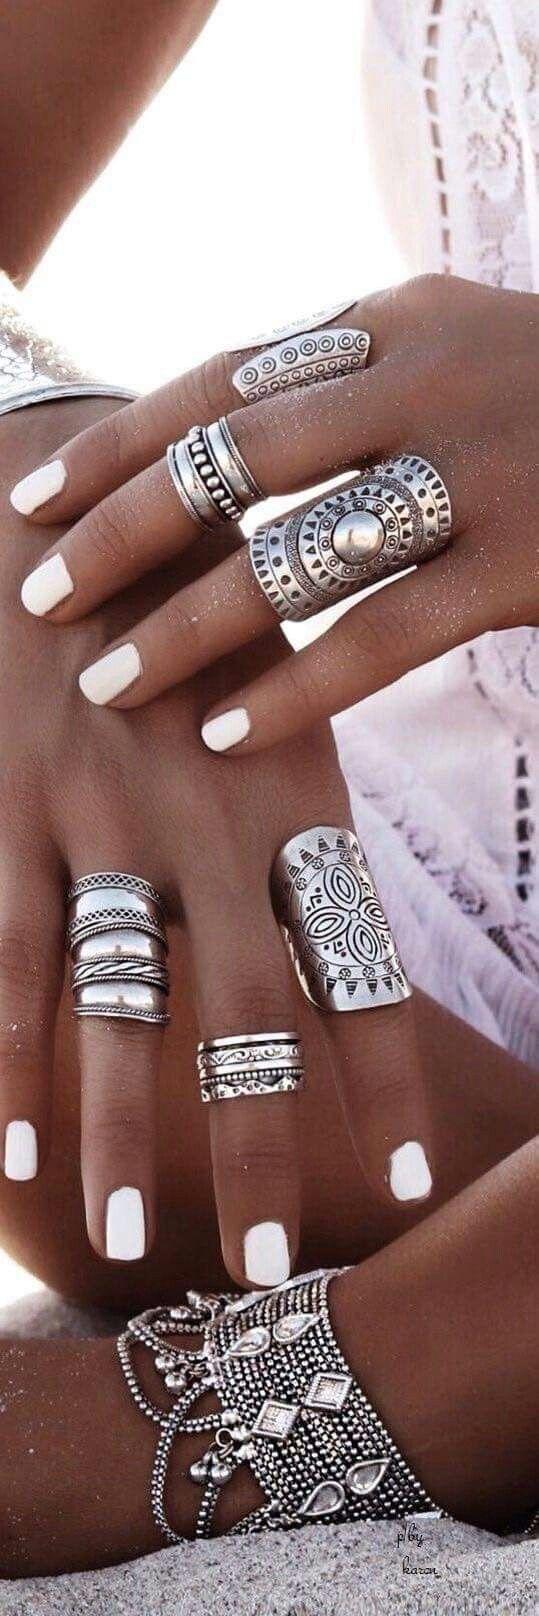 Pin by deborah peters on hands in pinterest jewelry